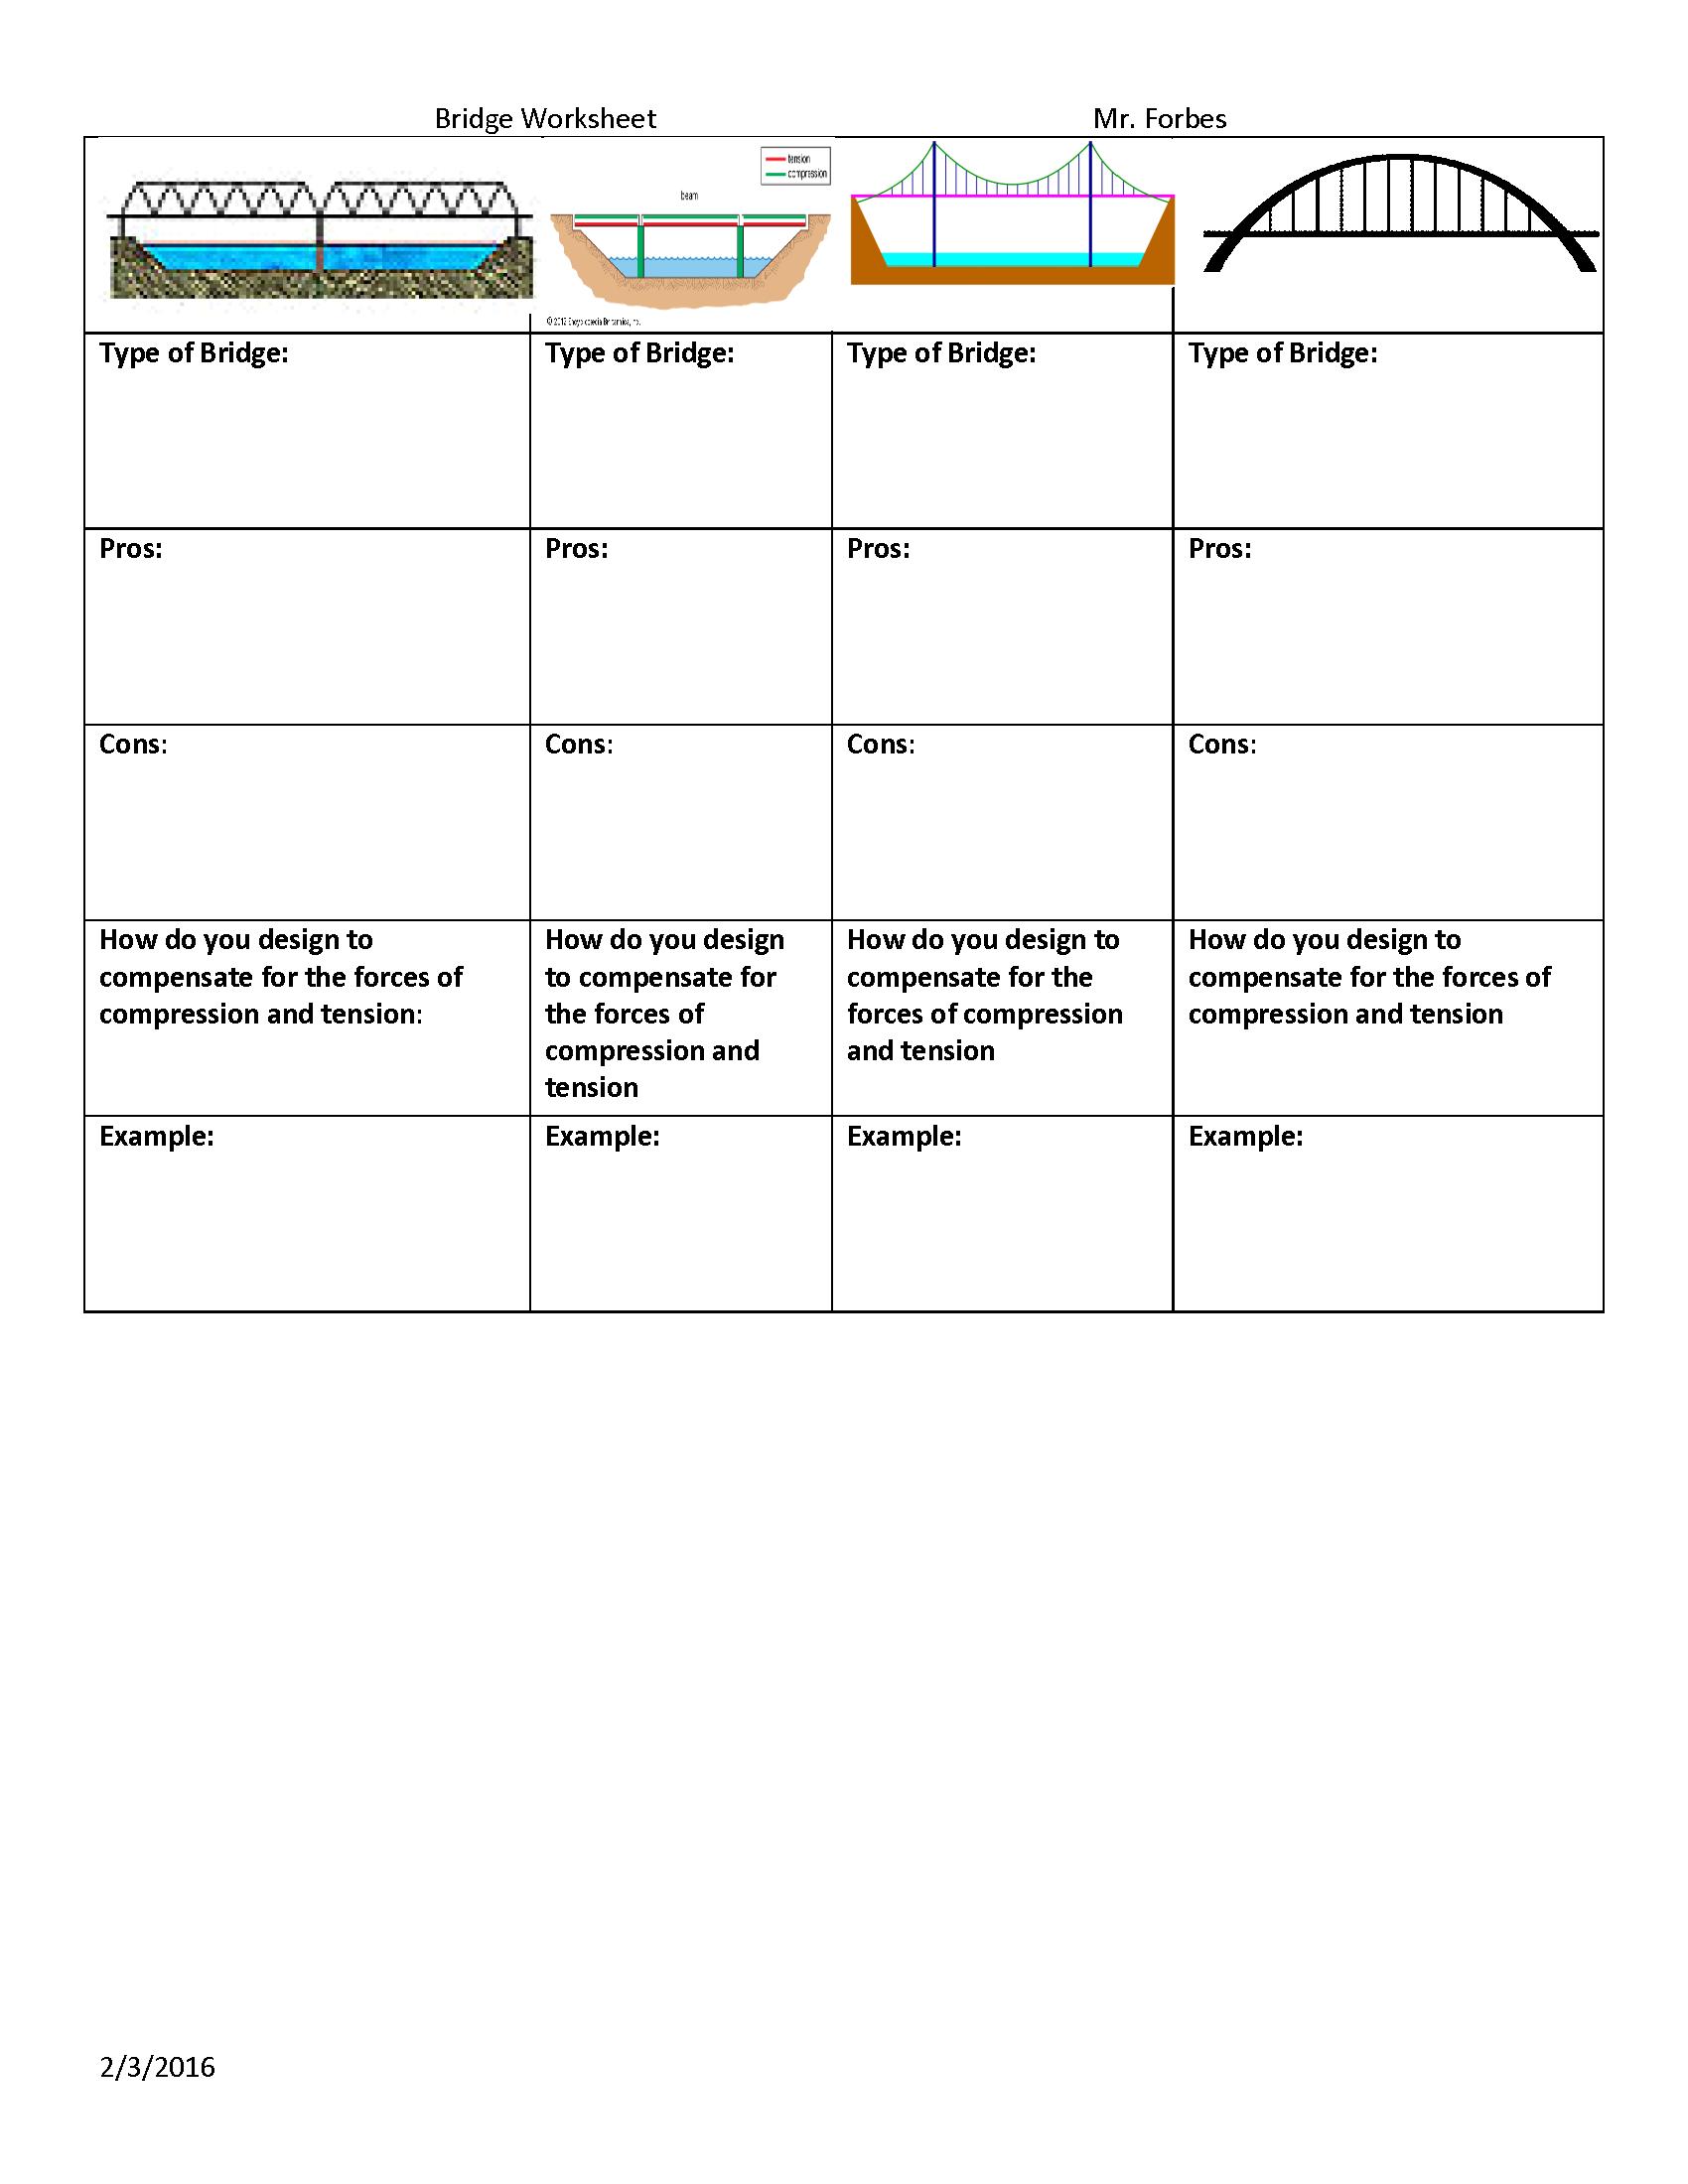 medium resolution of Worksheet to use the Bridge Project Grades 6 to 8   Stem teacher